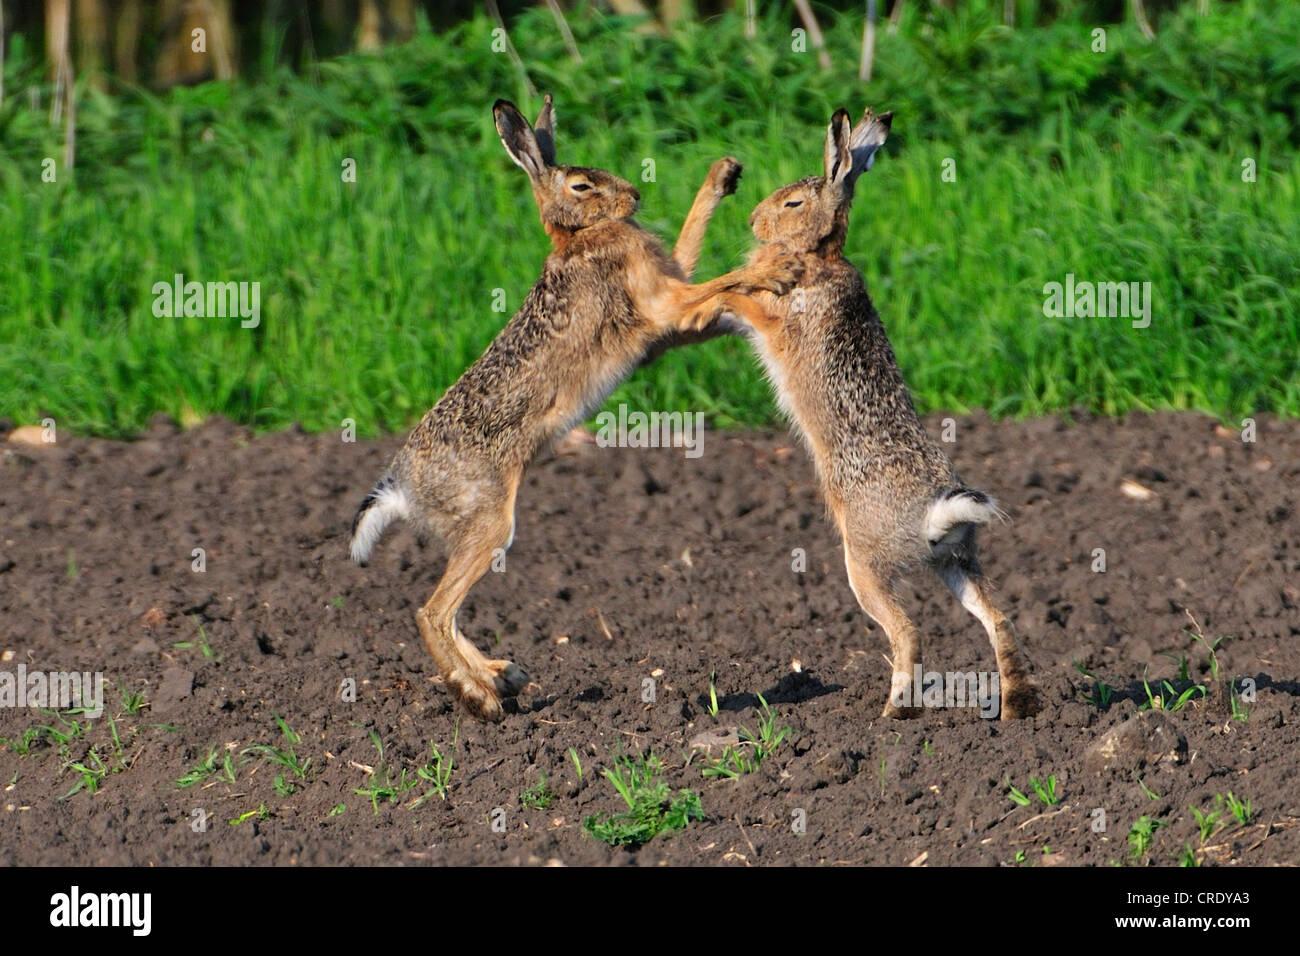 European hare (Lepus europaeus), boxing during the mating season, Austria, Neusiedler See - Stock Image